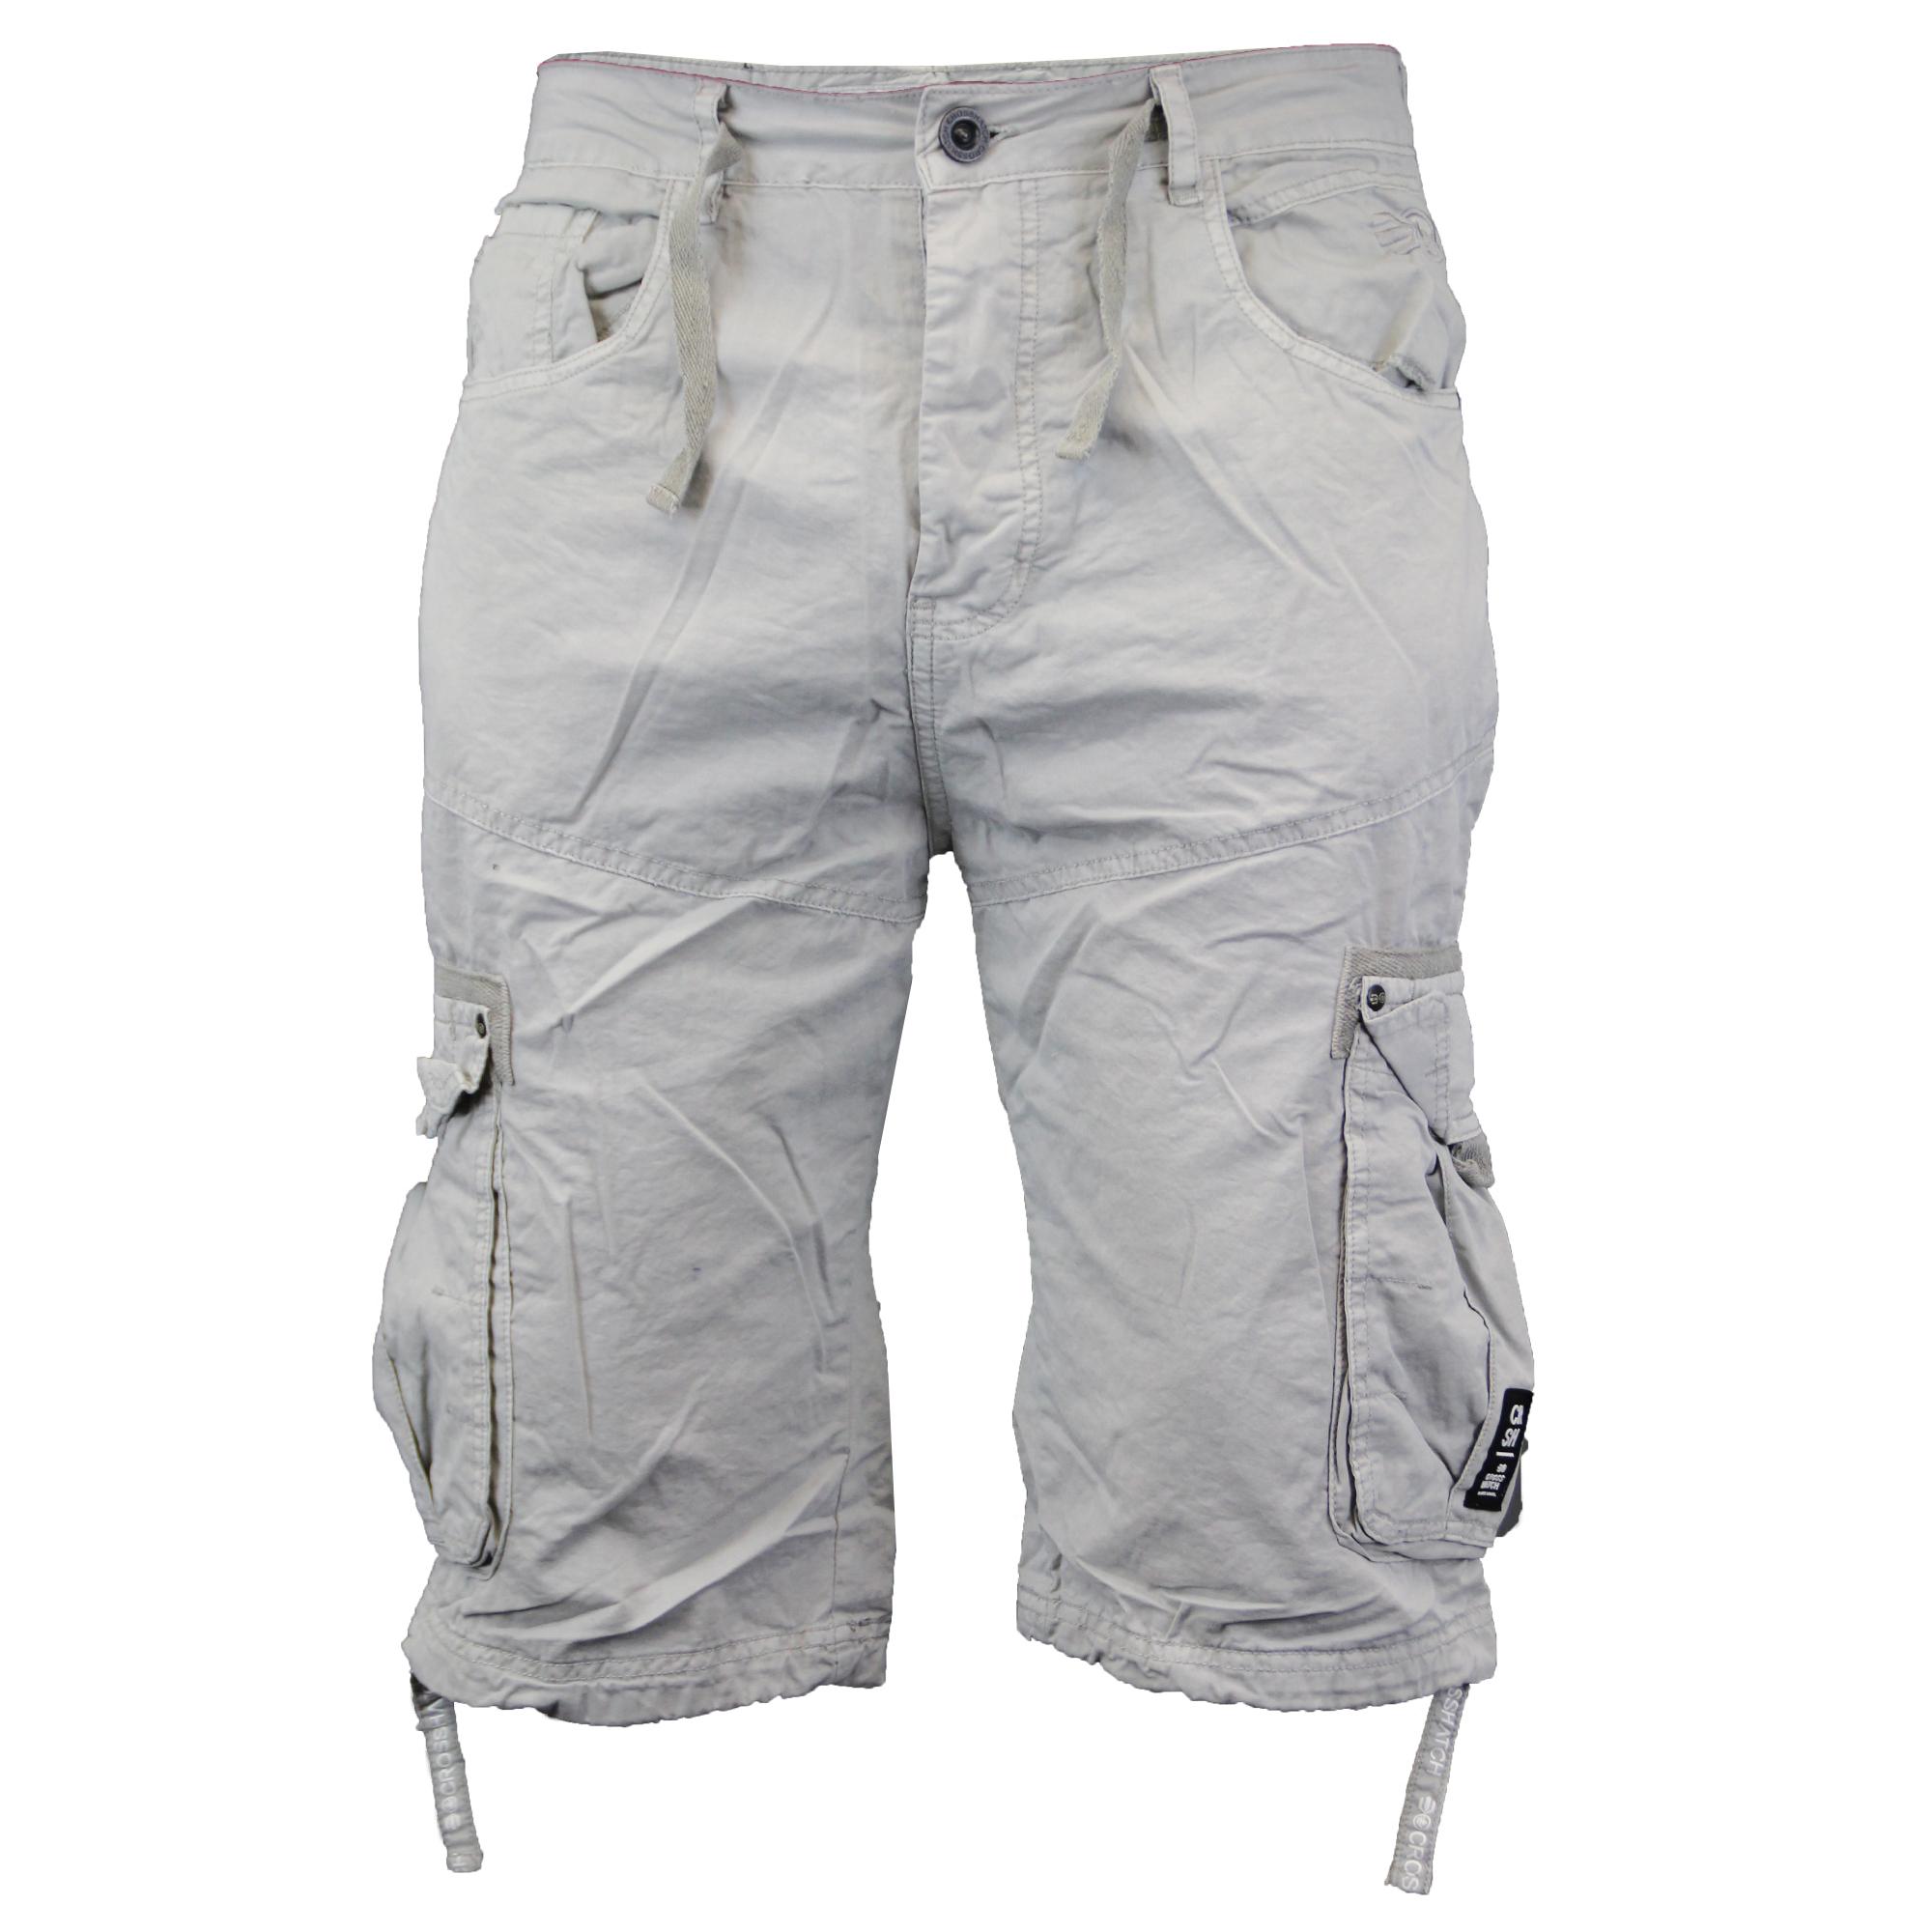 fe894503a4 mens Crosshatch chino style shorts combat cargo knee length half pants  summer | eBay